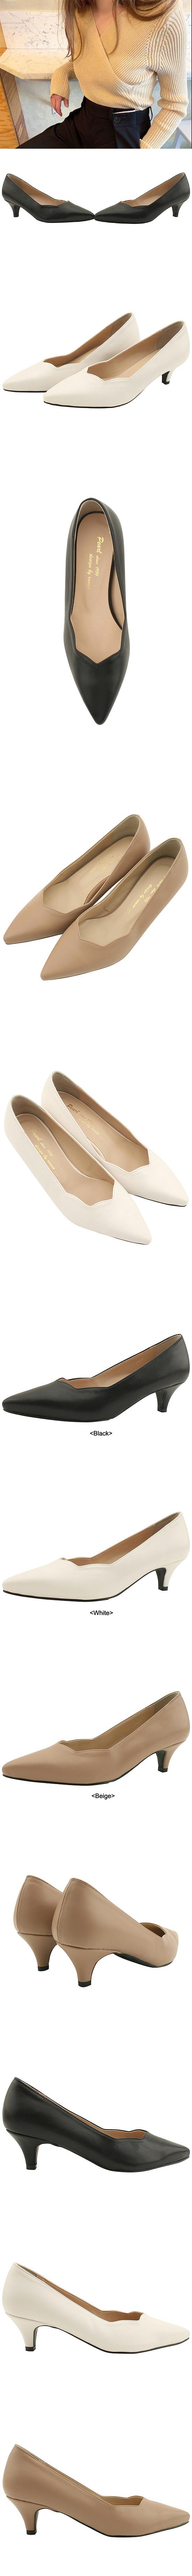 Wave Stiletto Middle Heel 5cm White